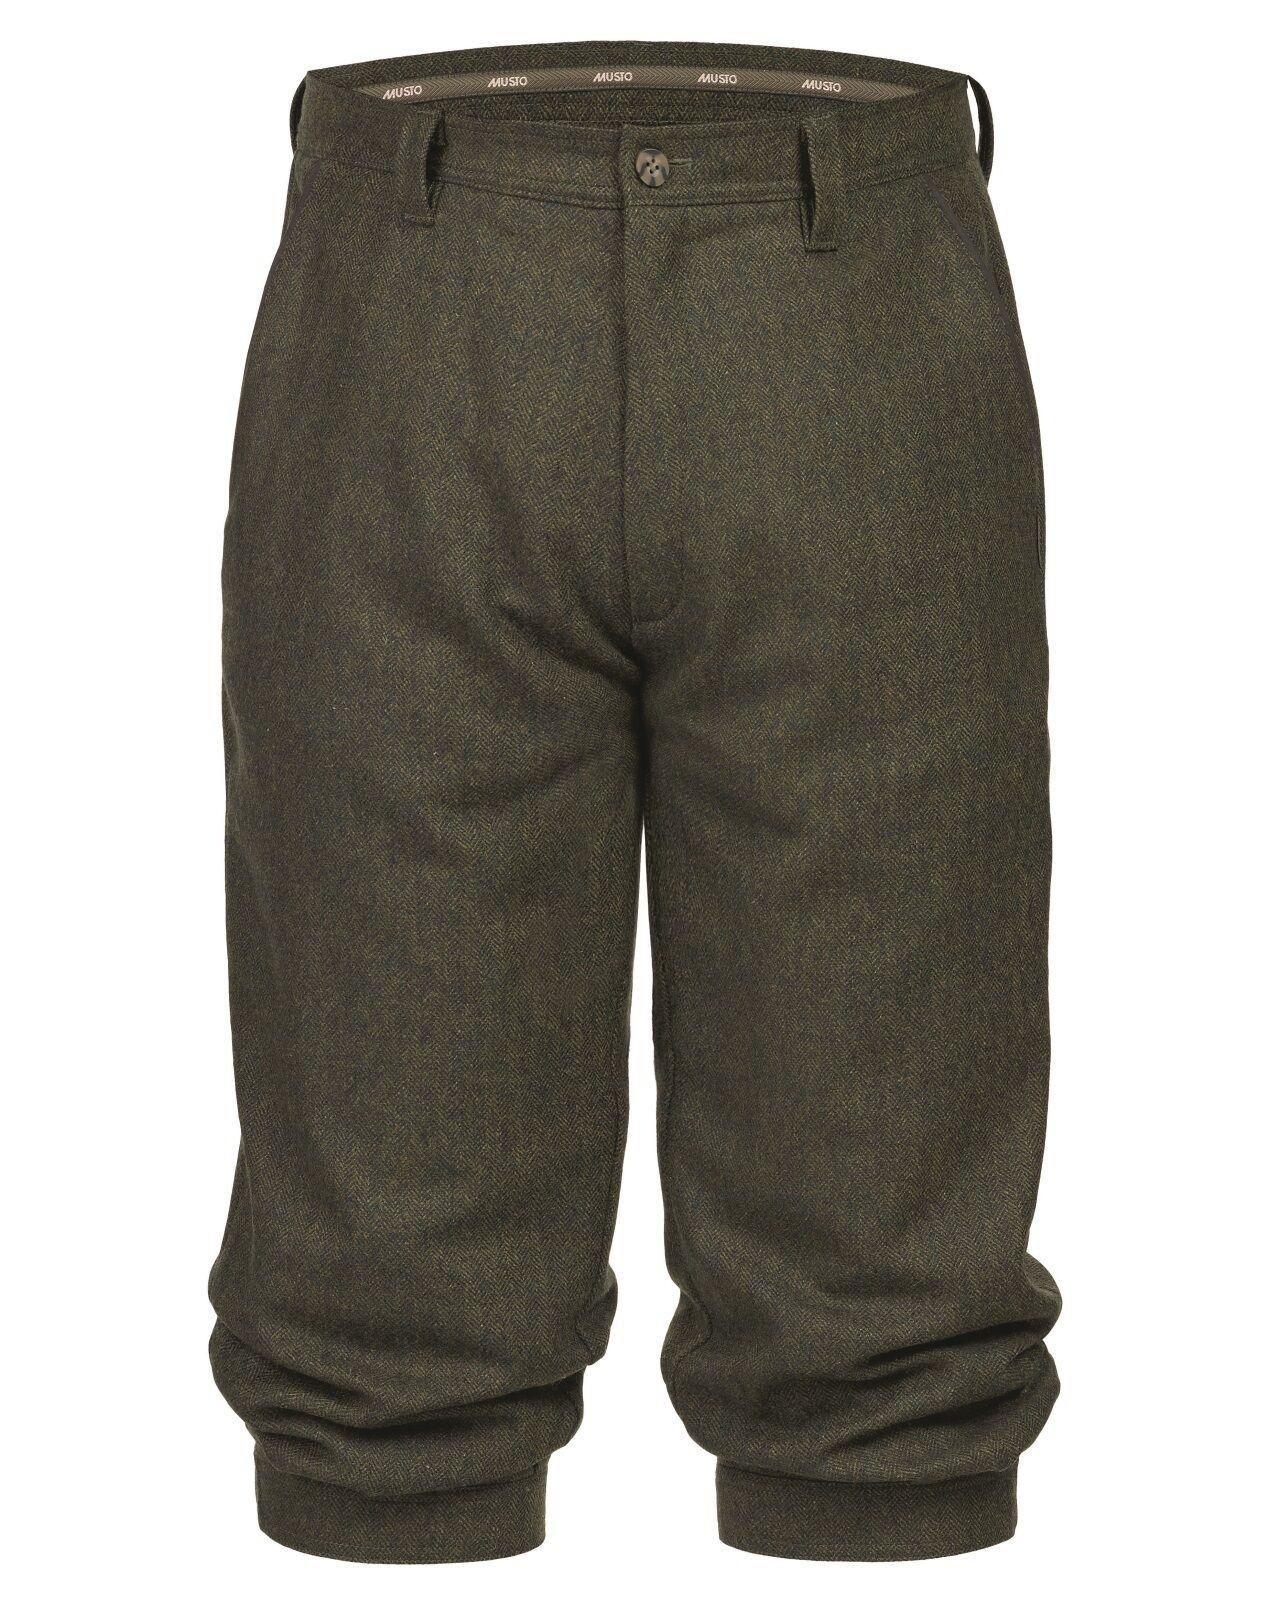 Mens Musto Stretch Technical Tweed Breeks (Heath) - all sizes - New